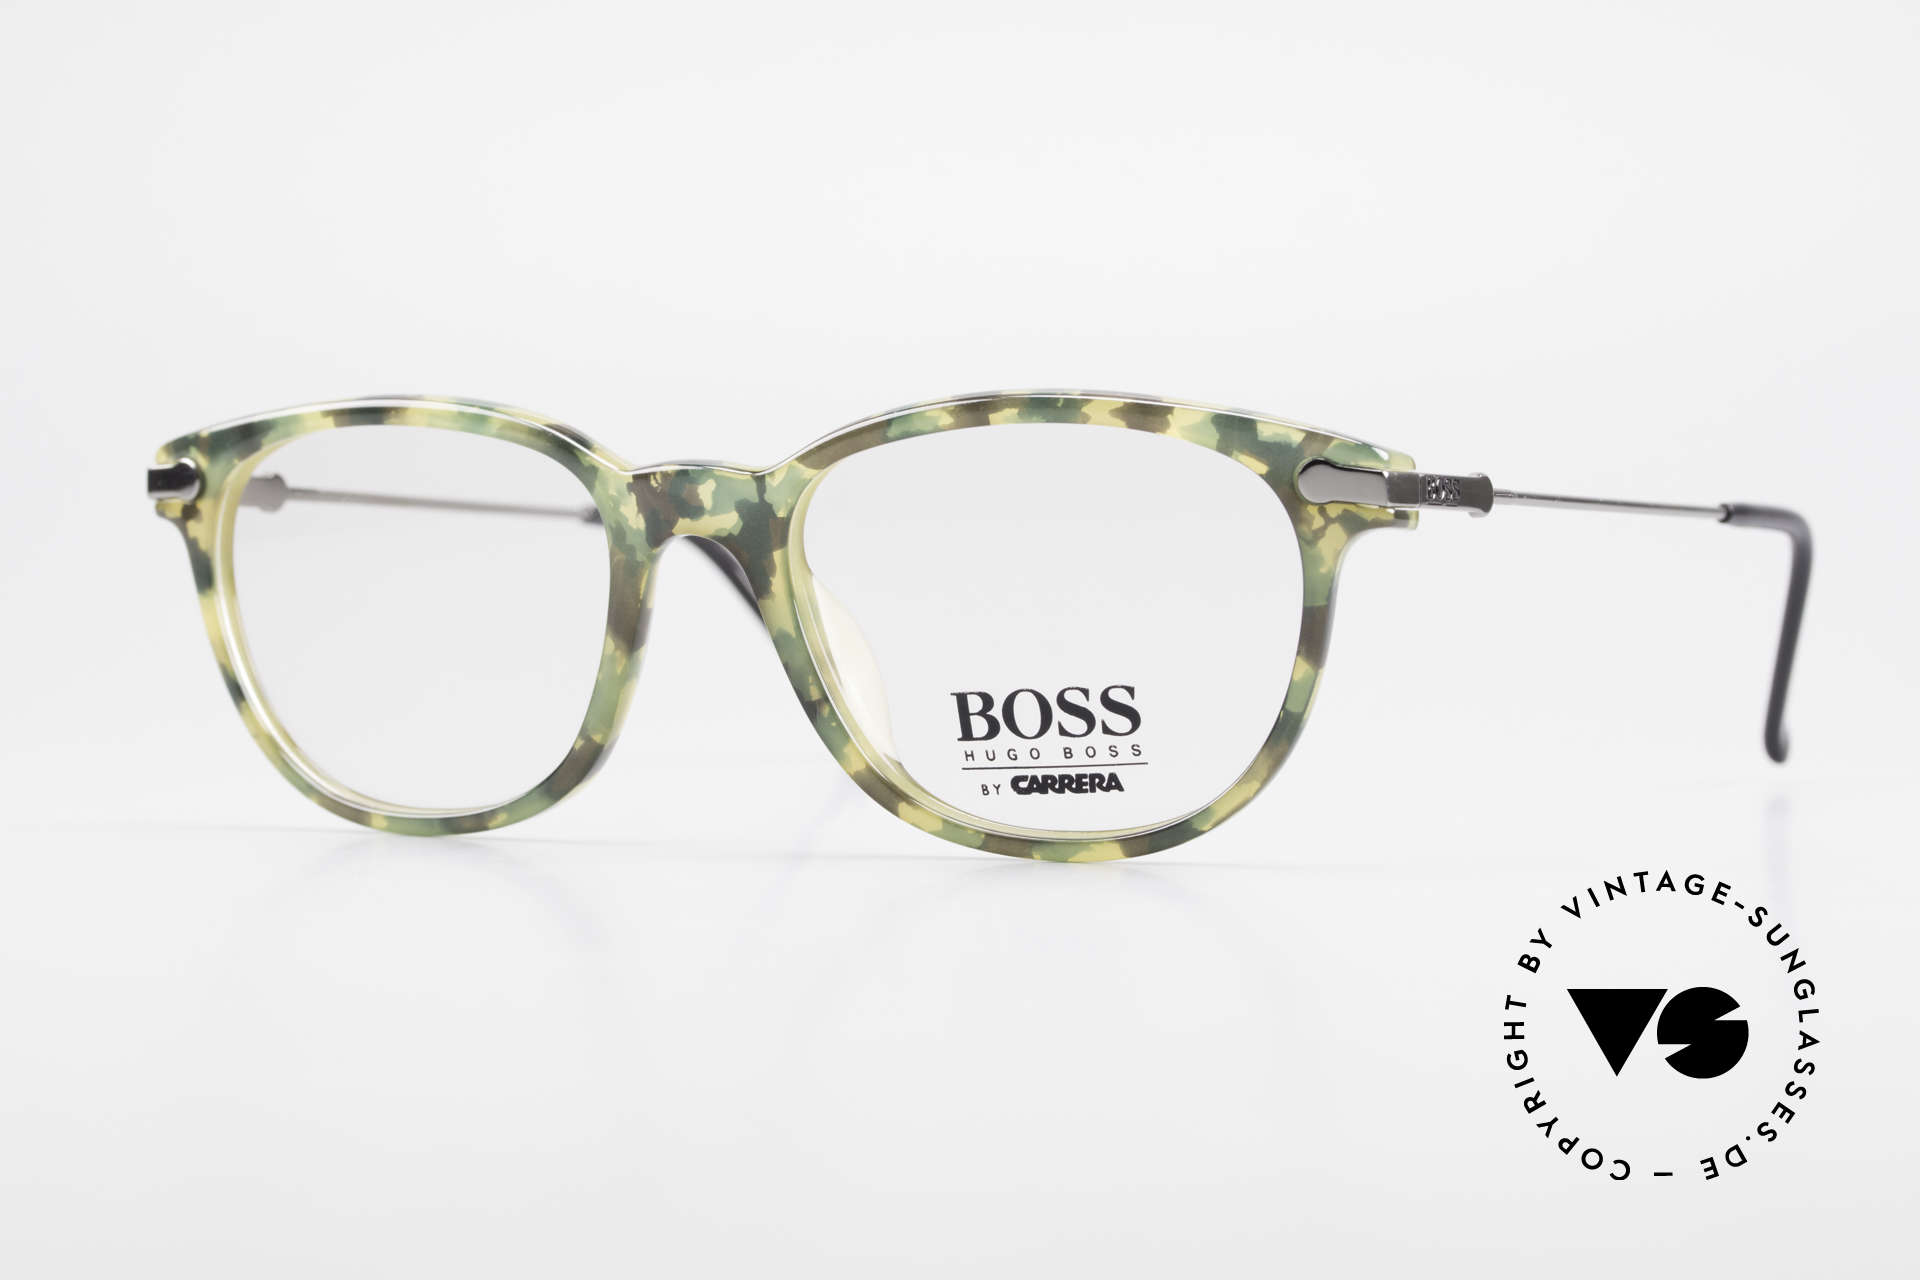 BOSS 5115 Camouflage Vintage Eyeglasses, striking BOSS vintage designer eyewear of the 90's, Made for Men